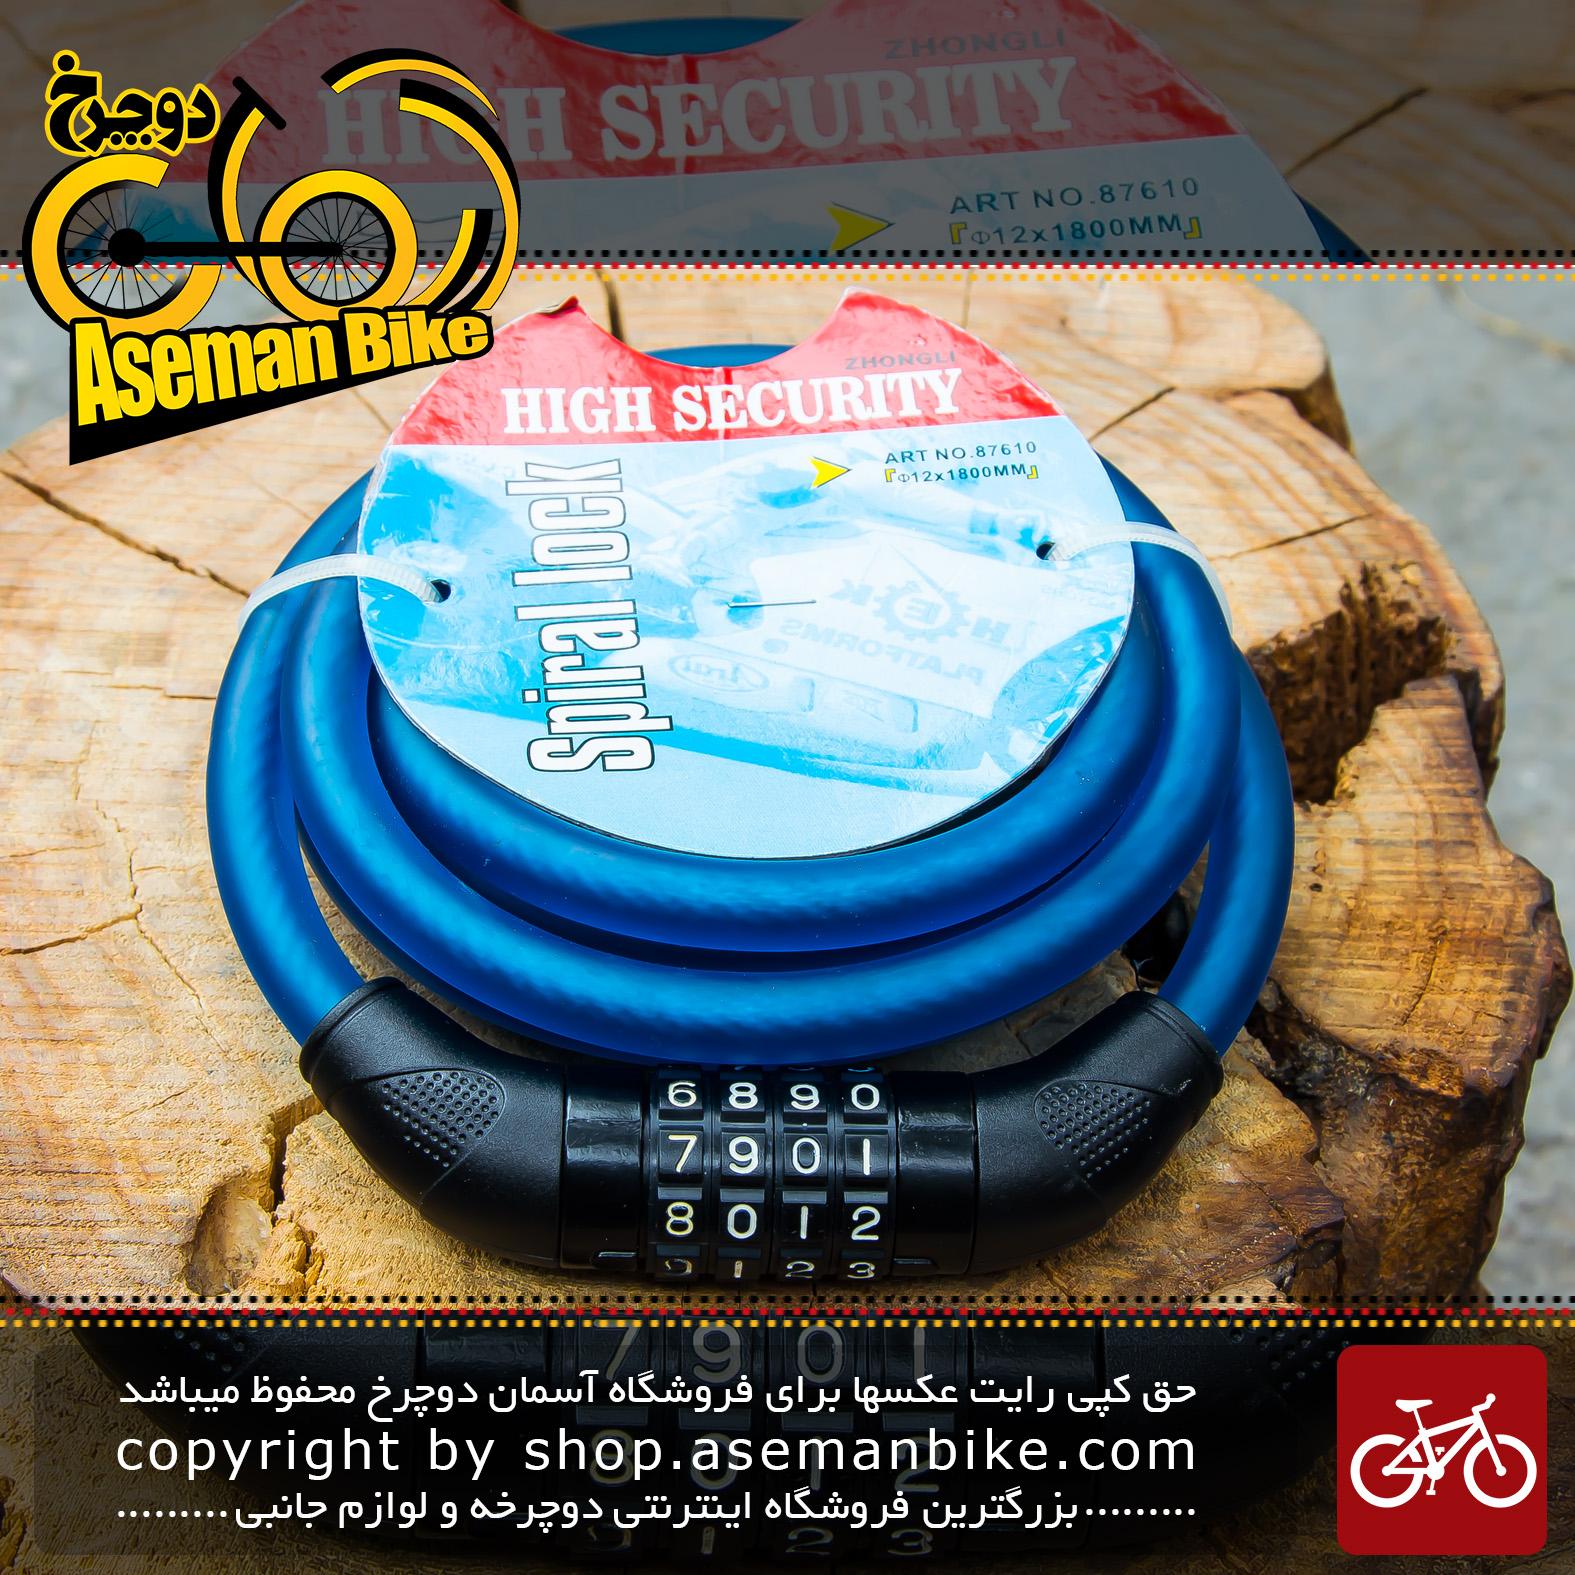 قفل کابلی رمزی دوچرخه مدل اسپیرال لاک ضد سرقت آبی مدل 87610 به قطر 12 و طول 1500 میلیمتری Spirtal Lock Security Cable Lock 87610